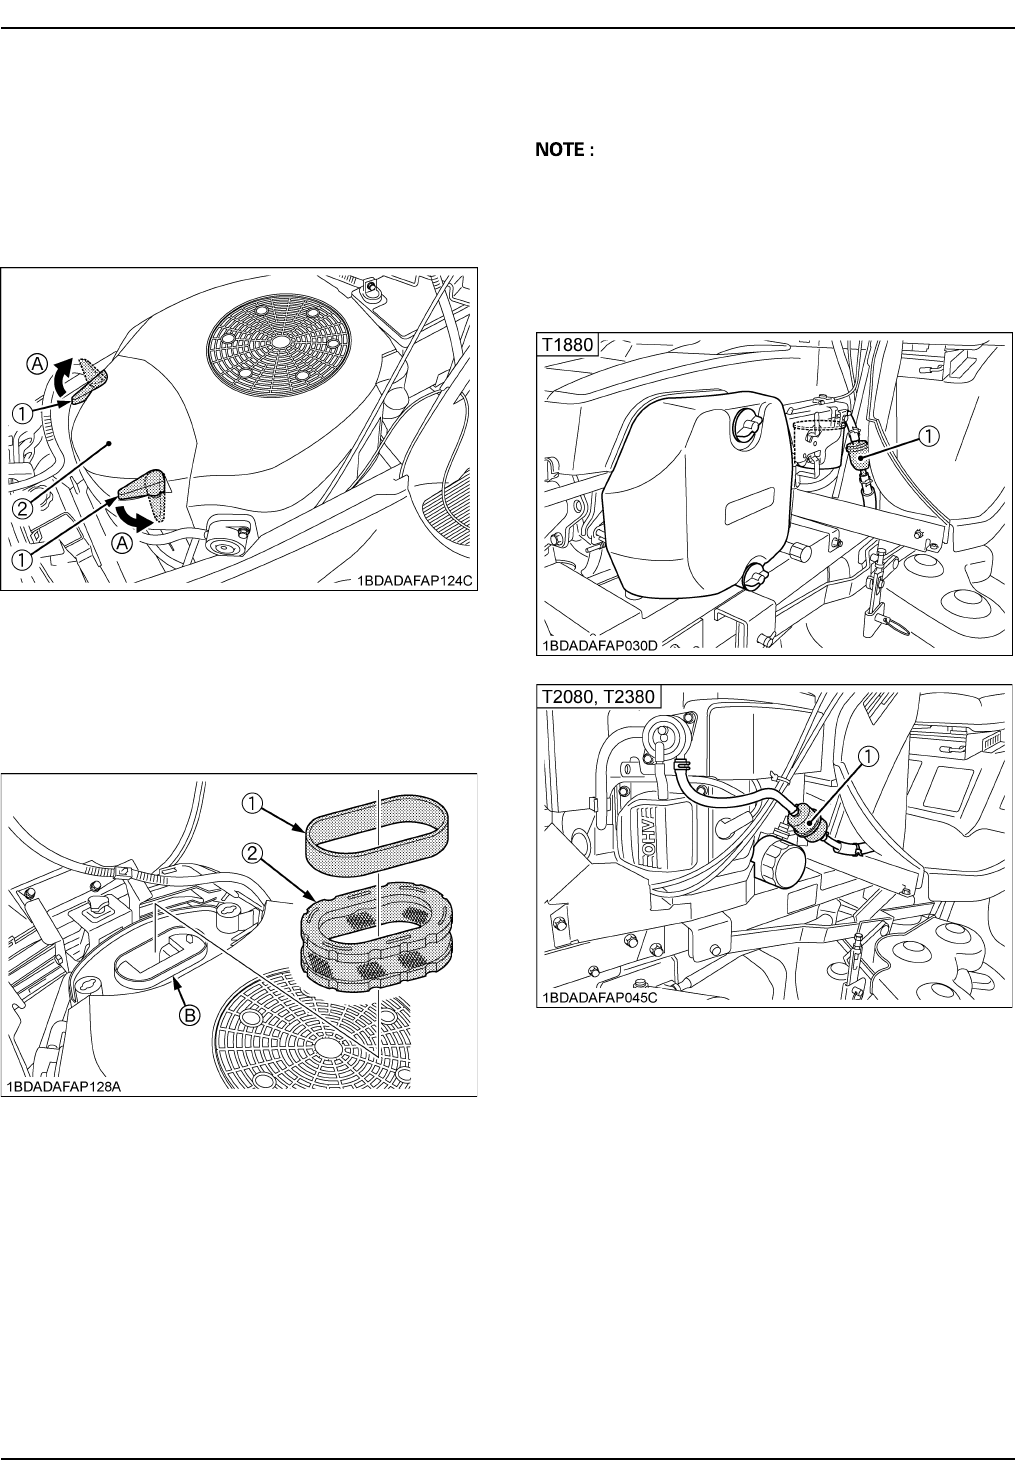 Miraculous Handleiding Kubota T1880 Pagina 68 Van 78 English Wiring 101 Olytiaxxcnl